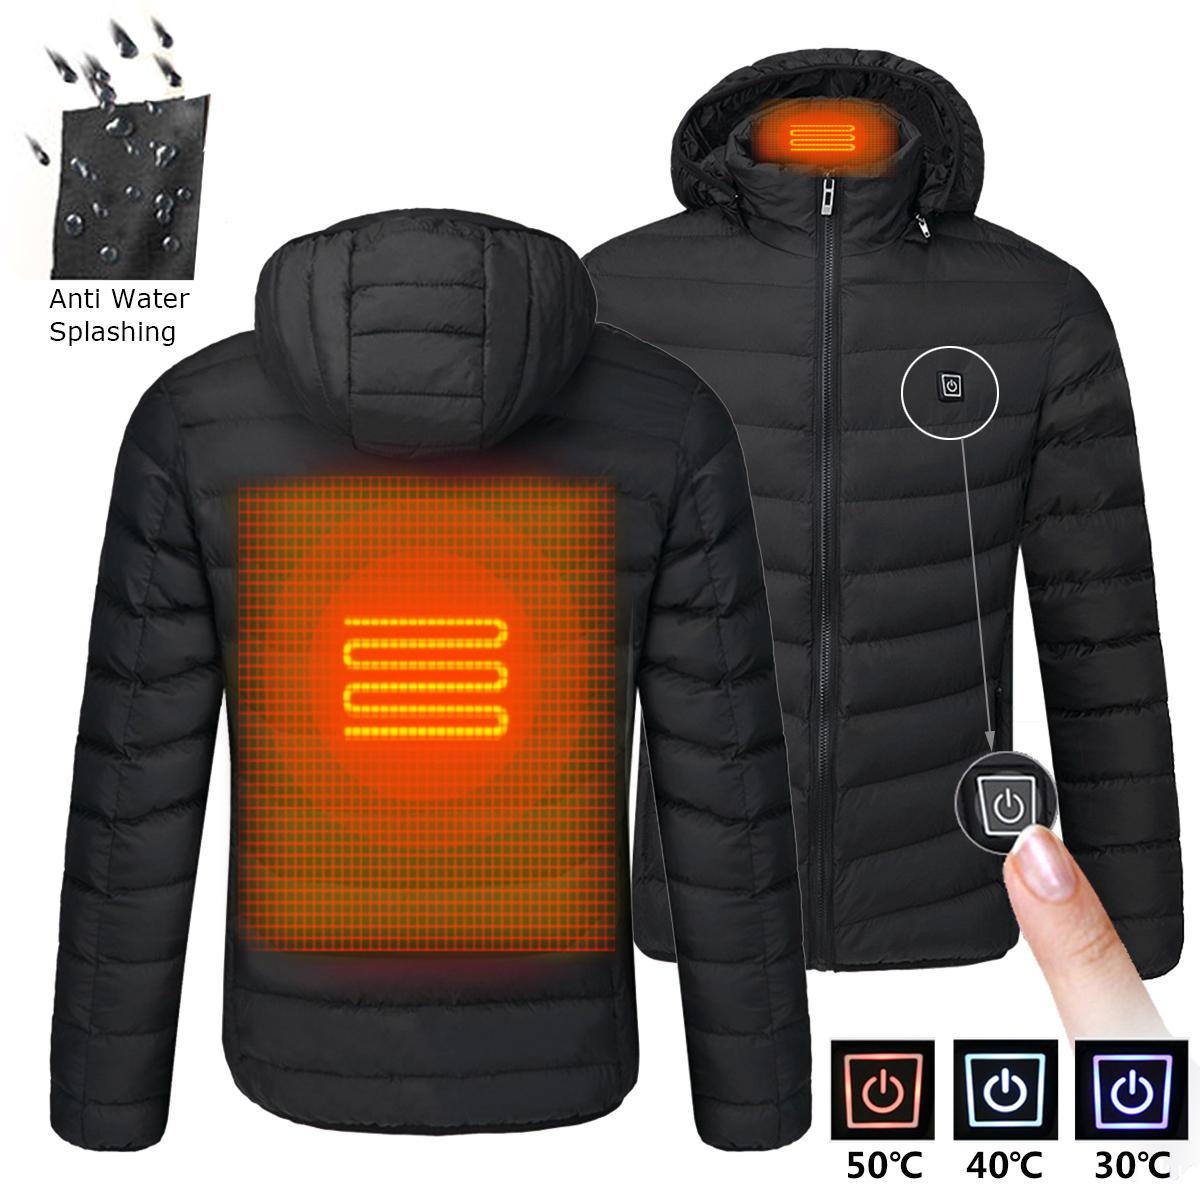 8efbe4892a9 Chaqueta de invierno con capucha abrigada de invierno con capucha para  espalda de cuello uterino USB